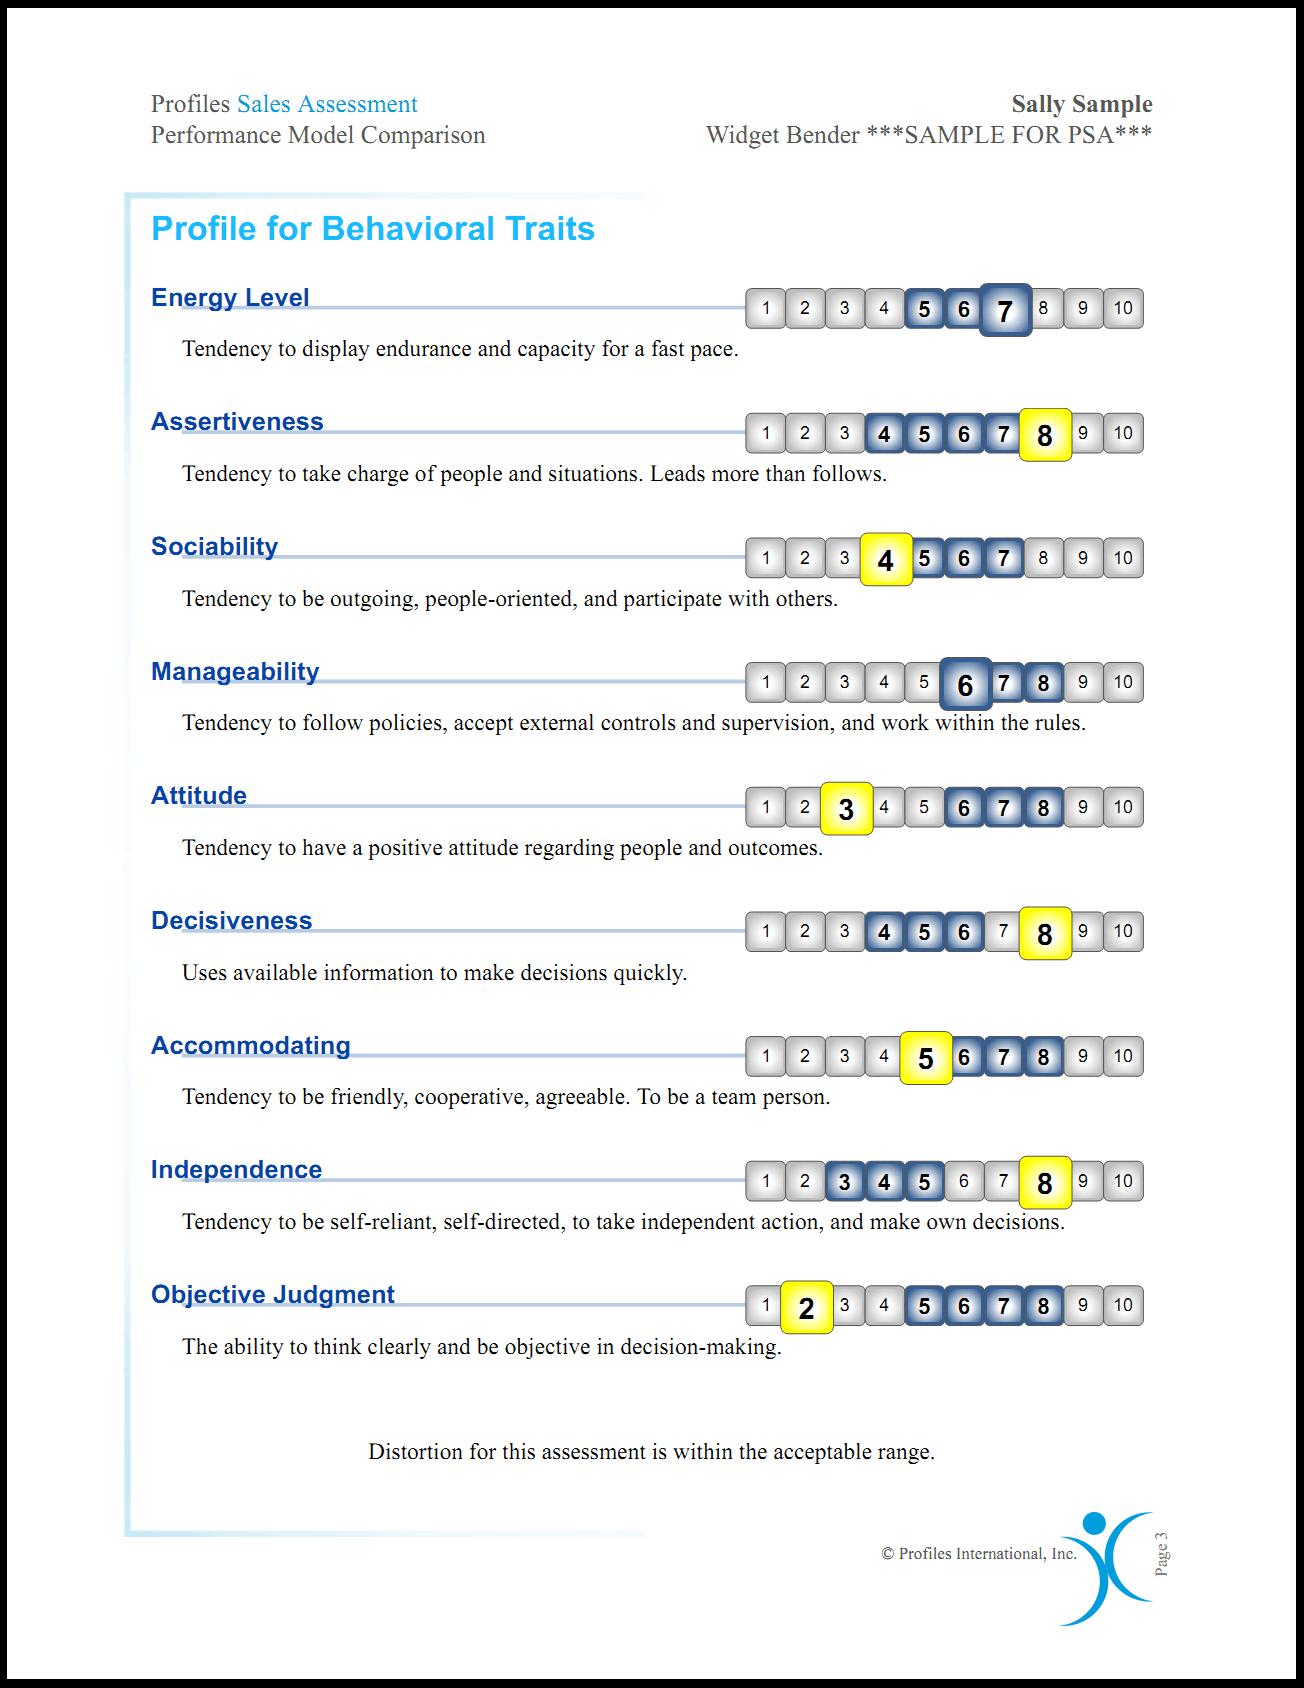 Performance Model Comparison